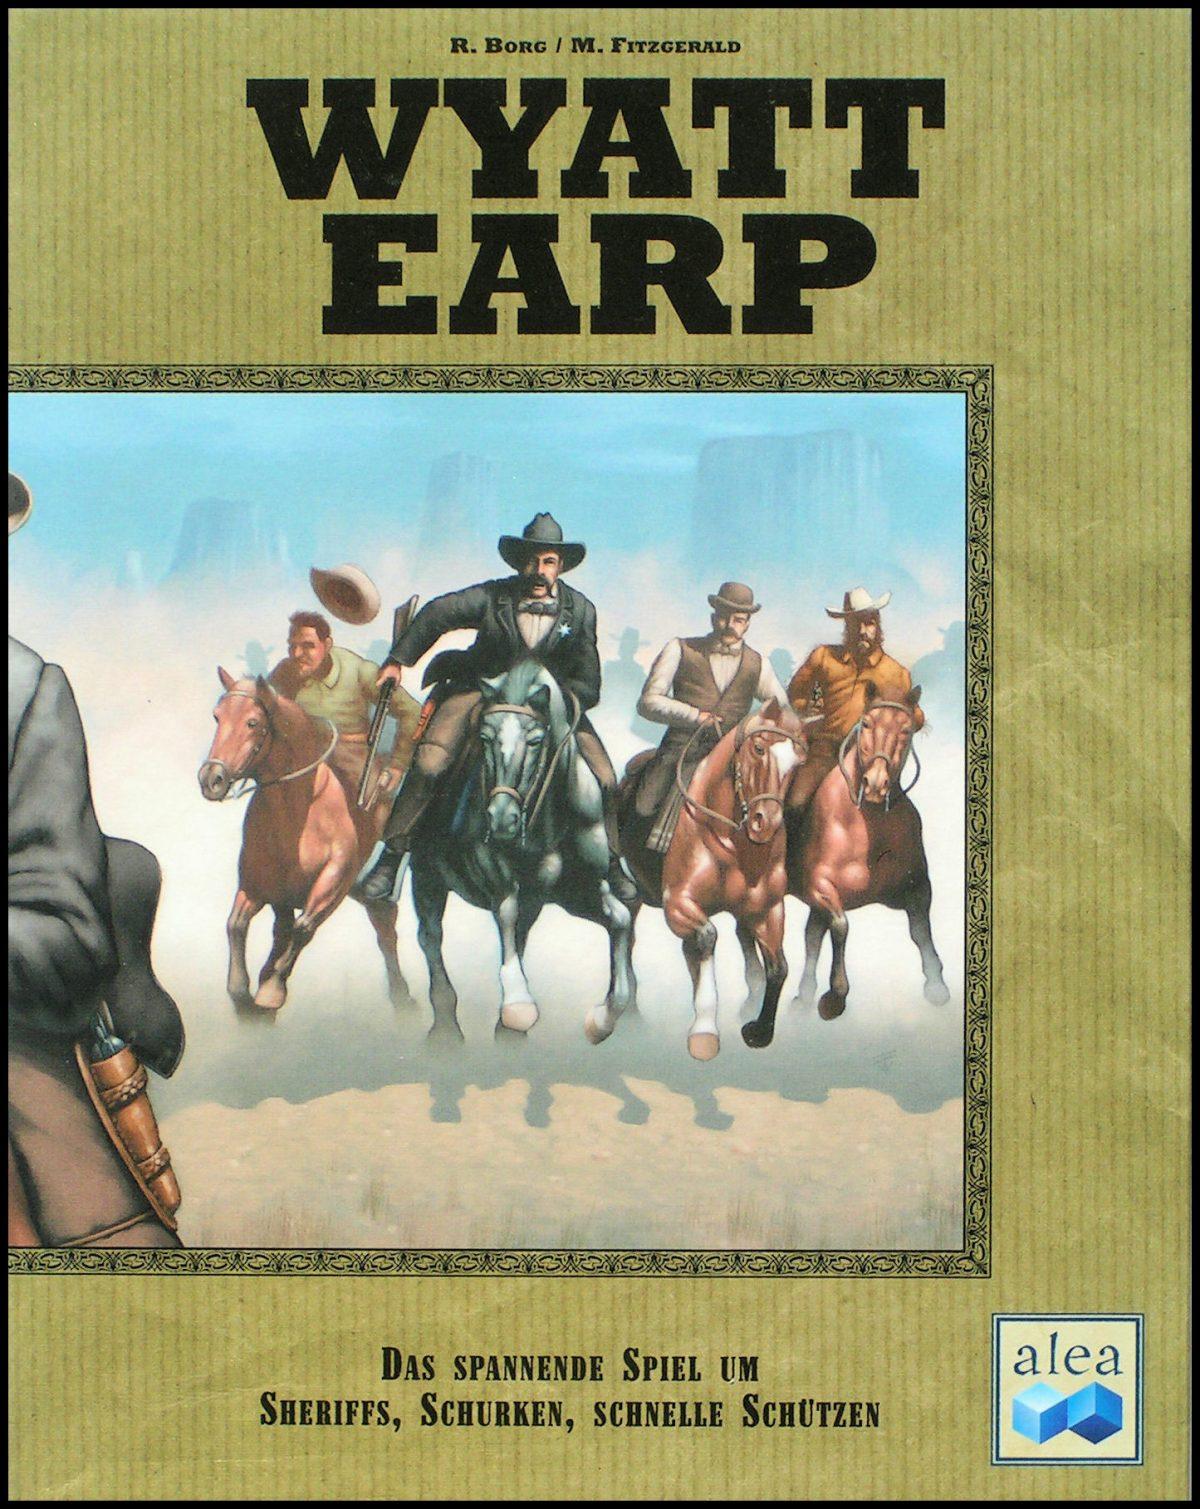 Wyatt Earp - Front Of The Box